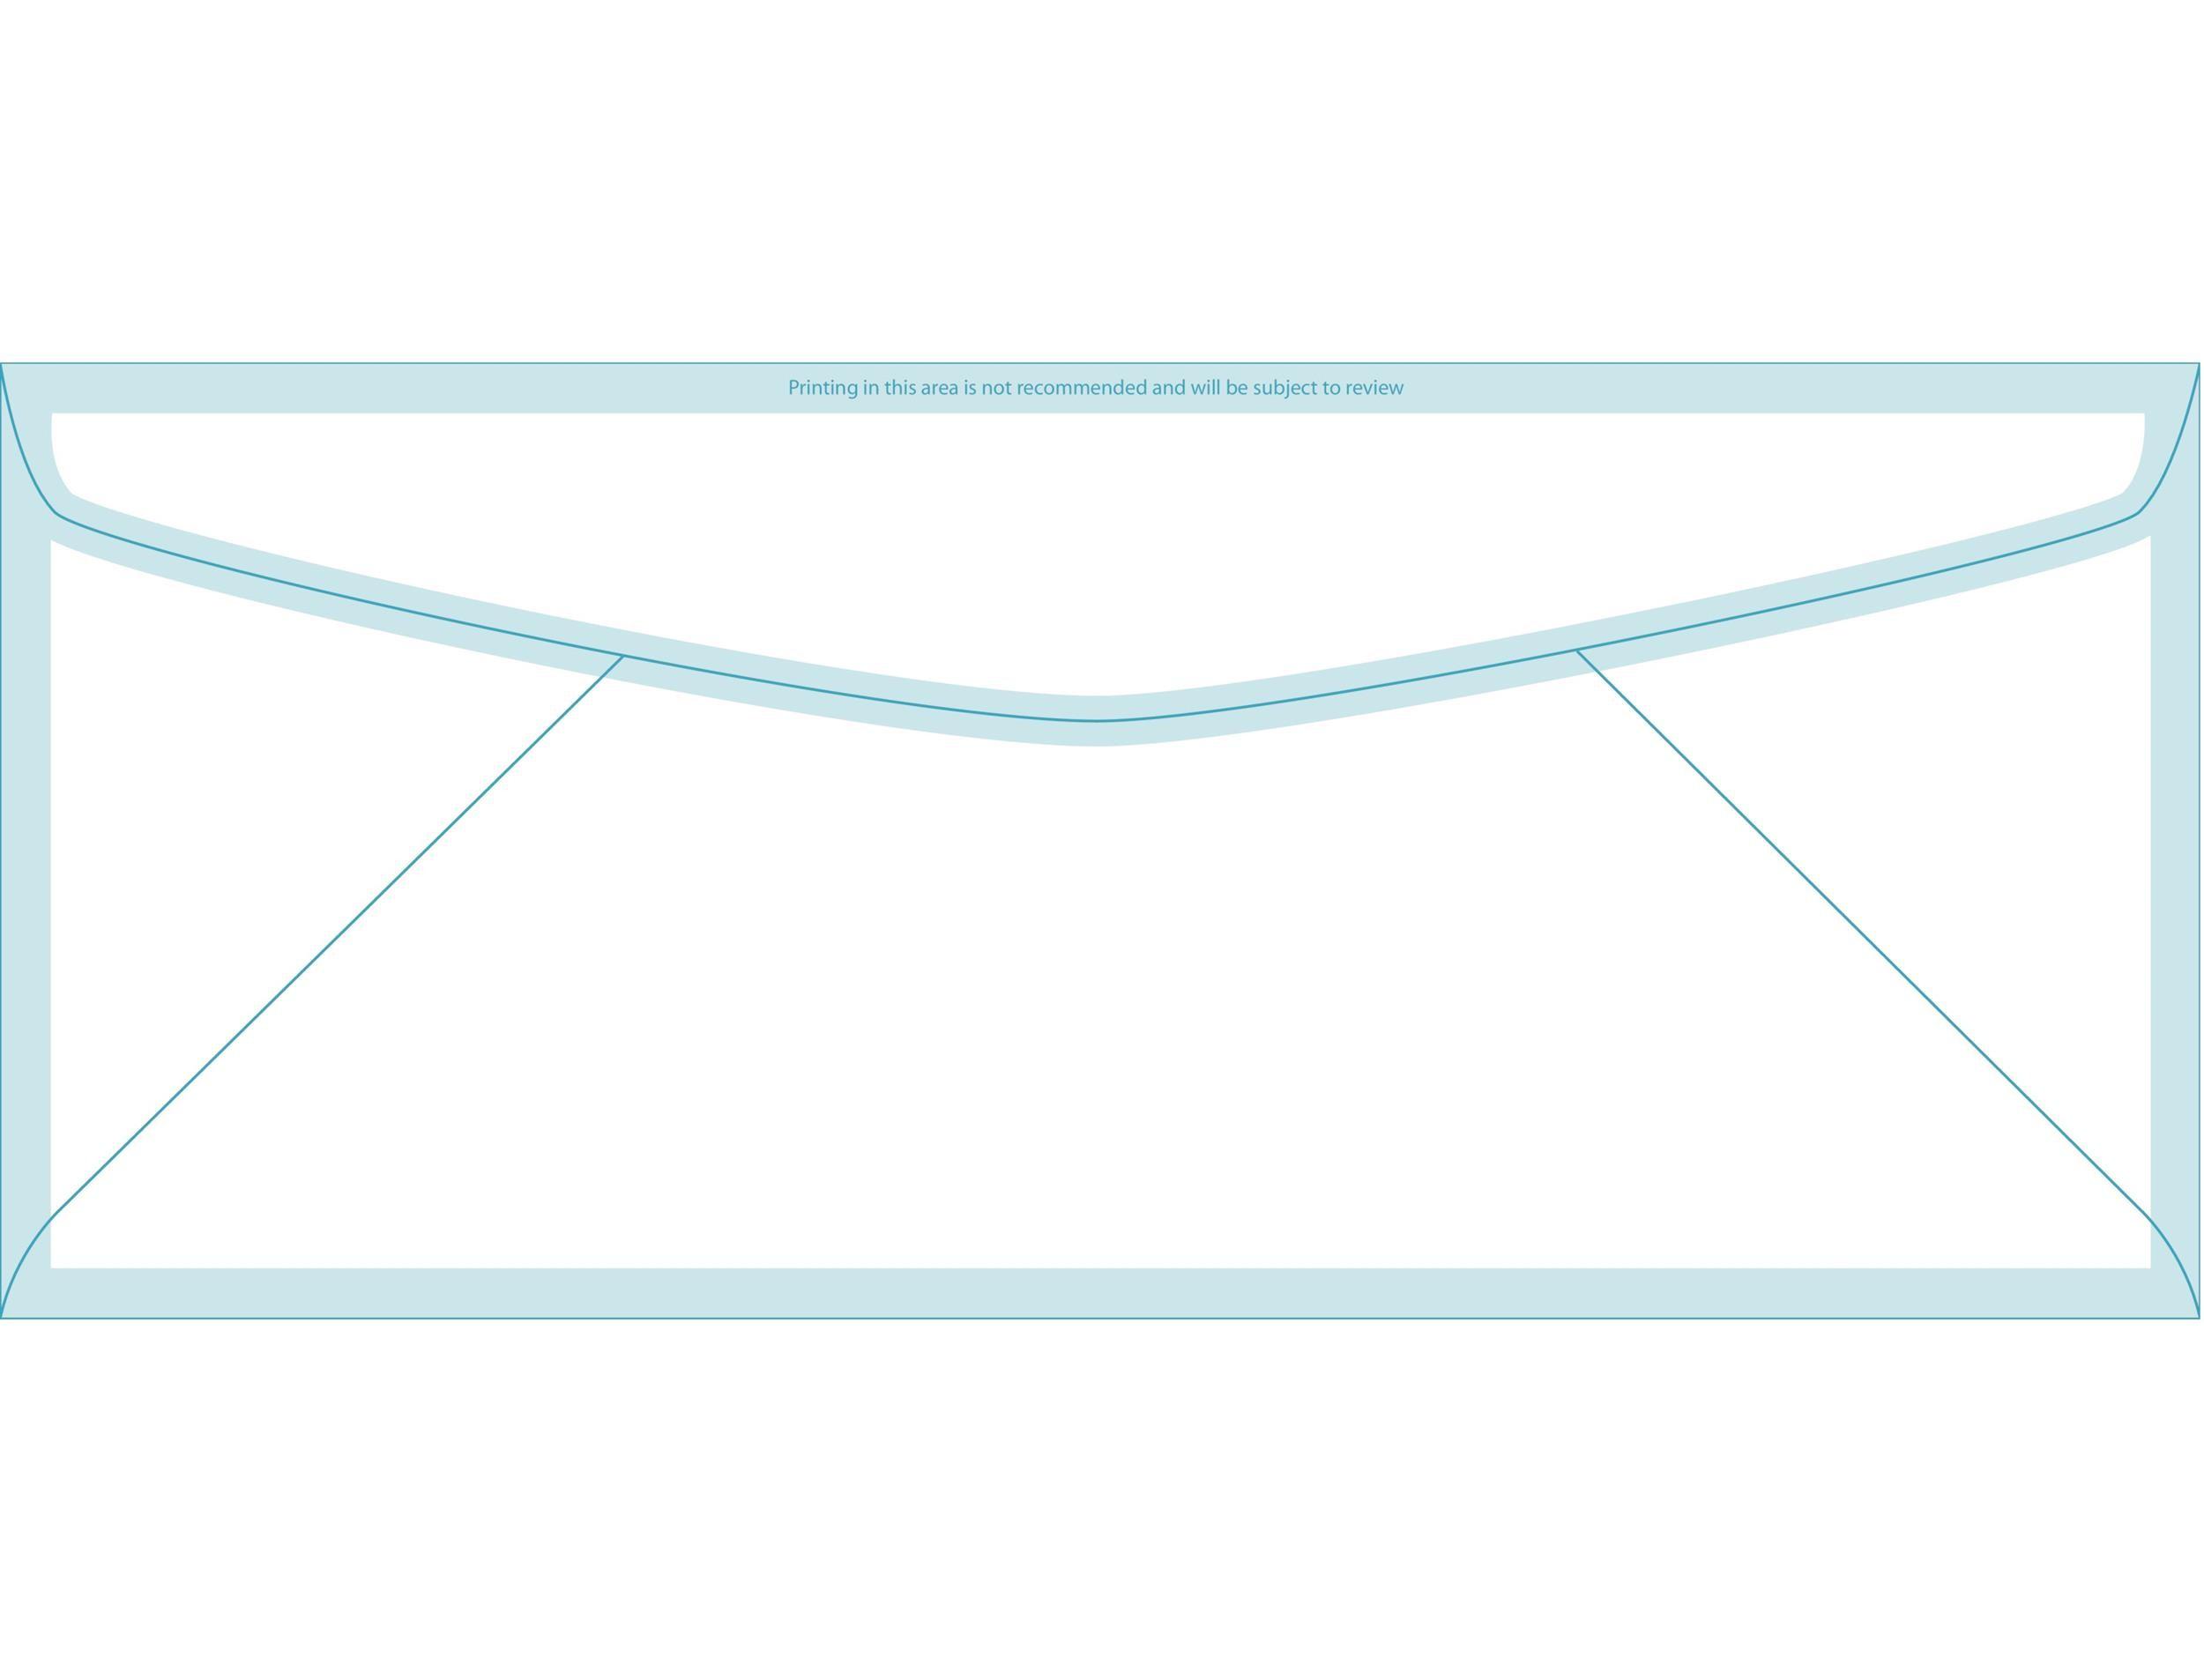 40+ FREE Envelope Templates (Word + PDF) - Template Lab - envelope printing template